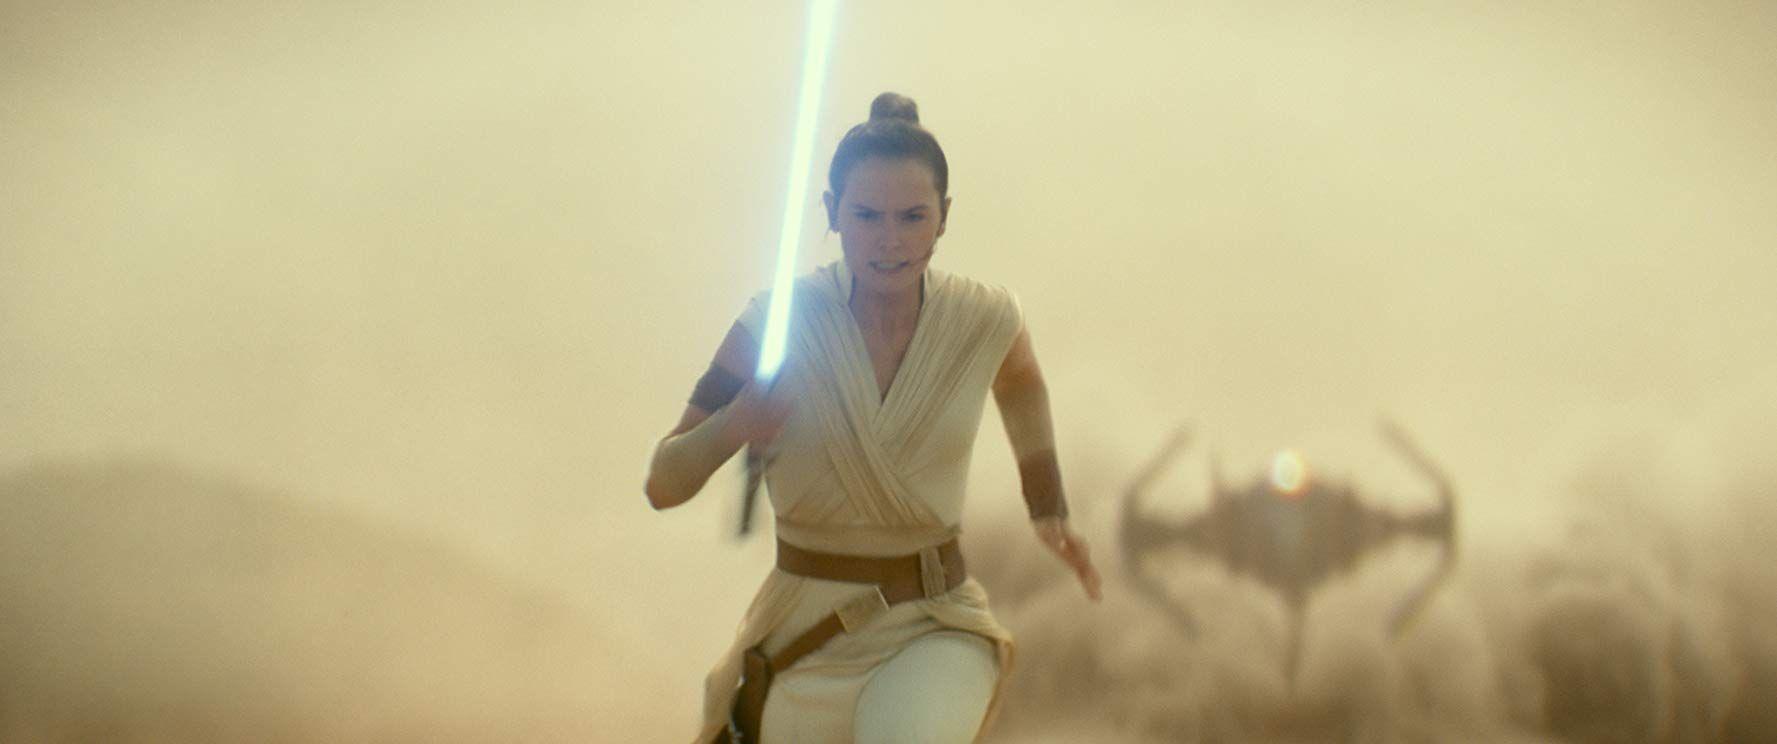 Imagen 1 de Star Wars: El Ascenso de Skywalker